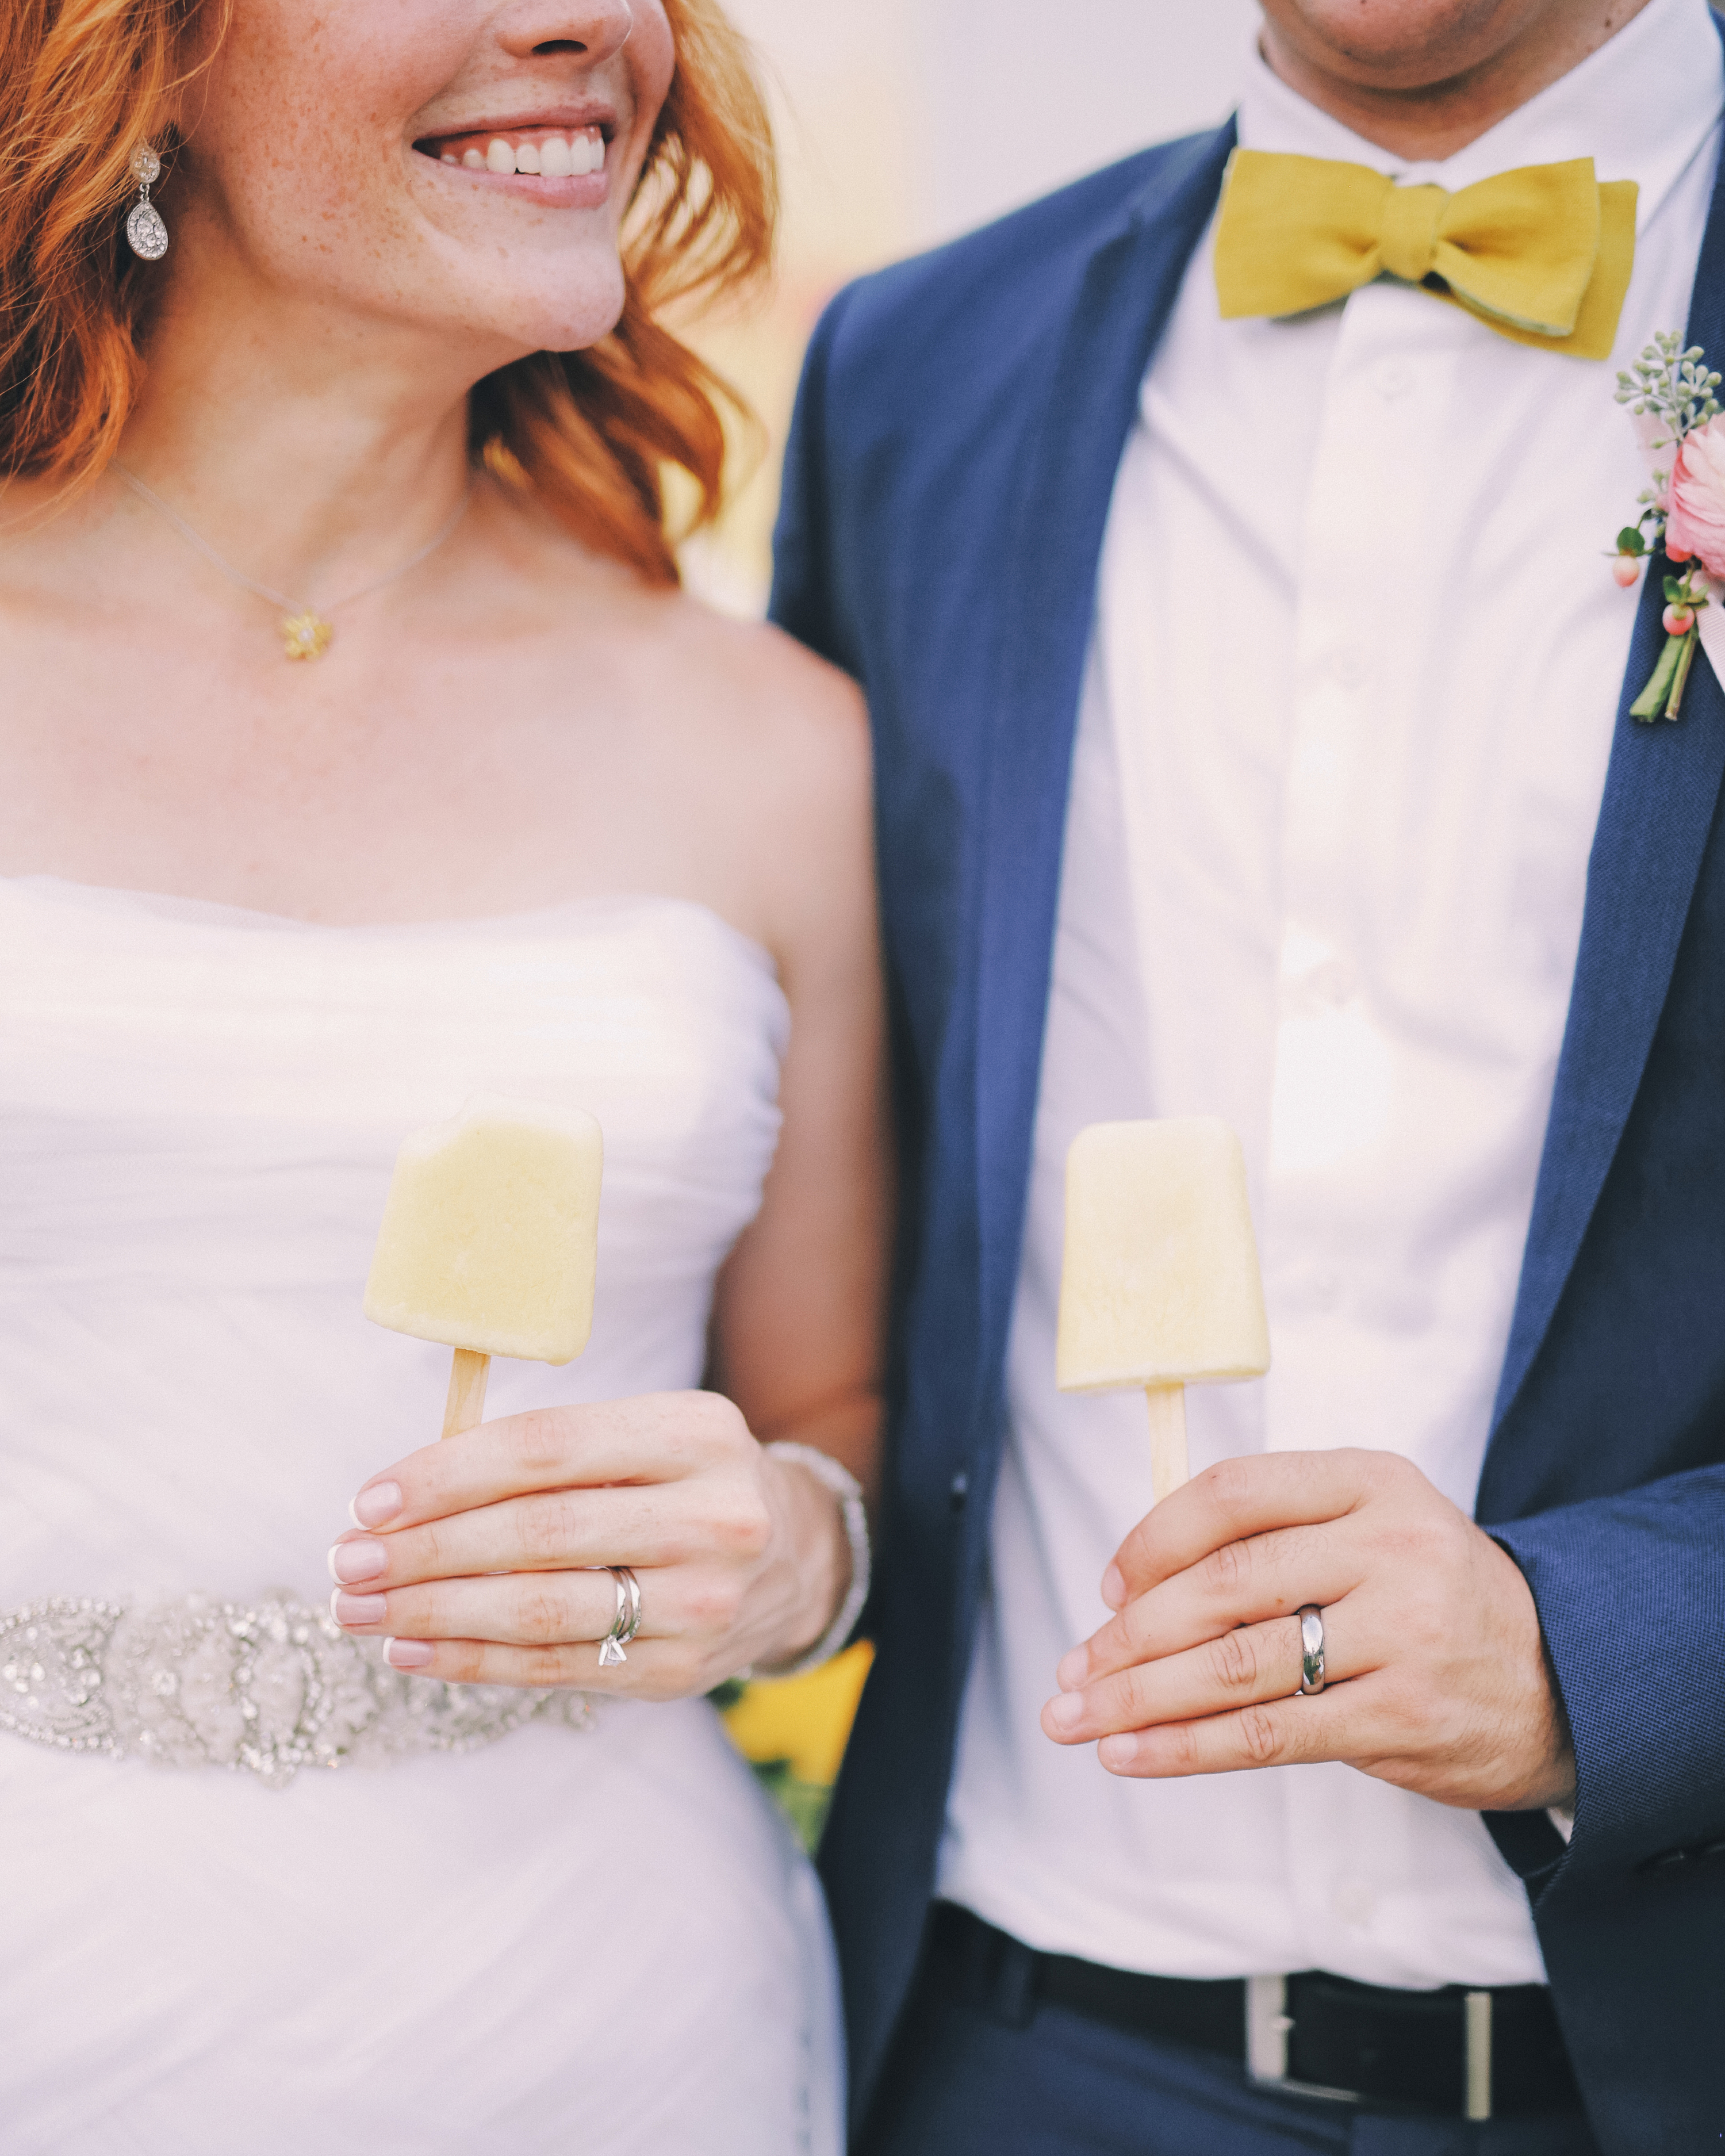 katie-brian-wedding-popsicles-3799-s111885-0515.jpg